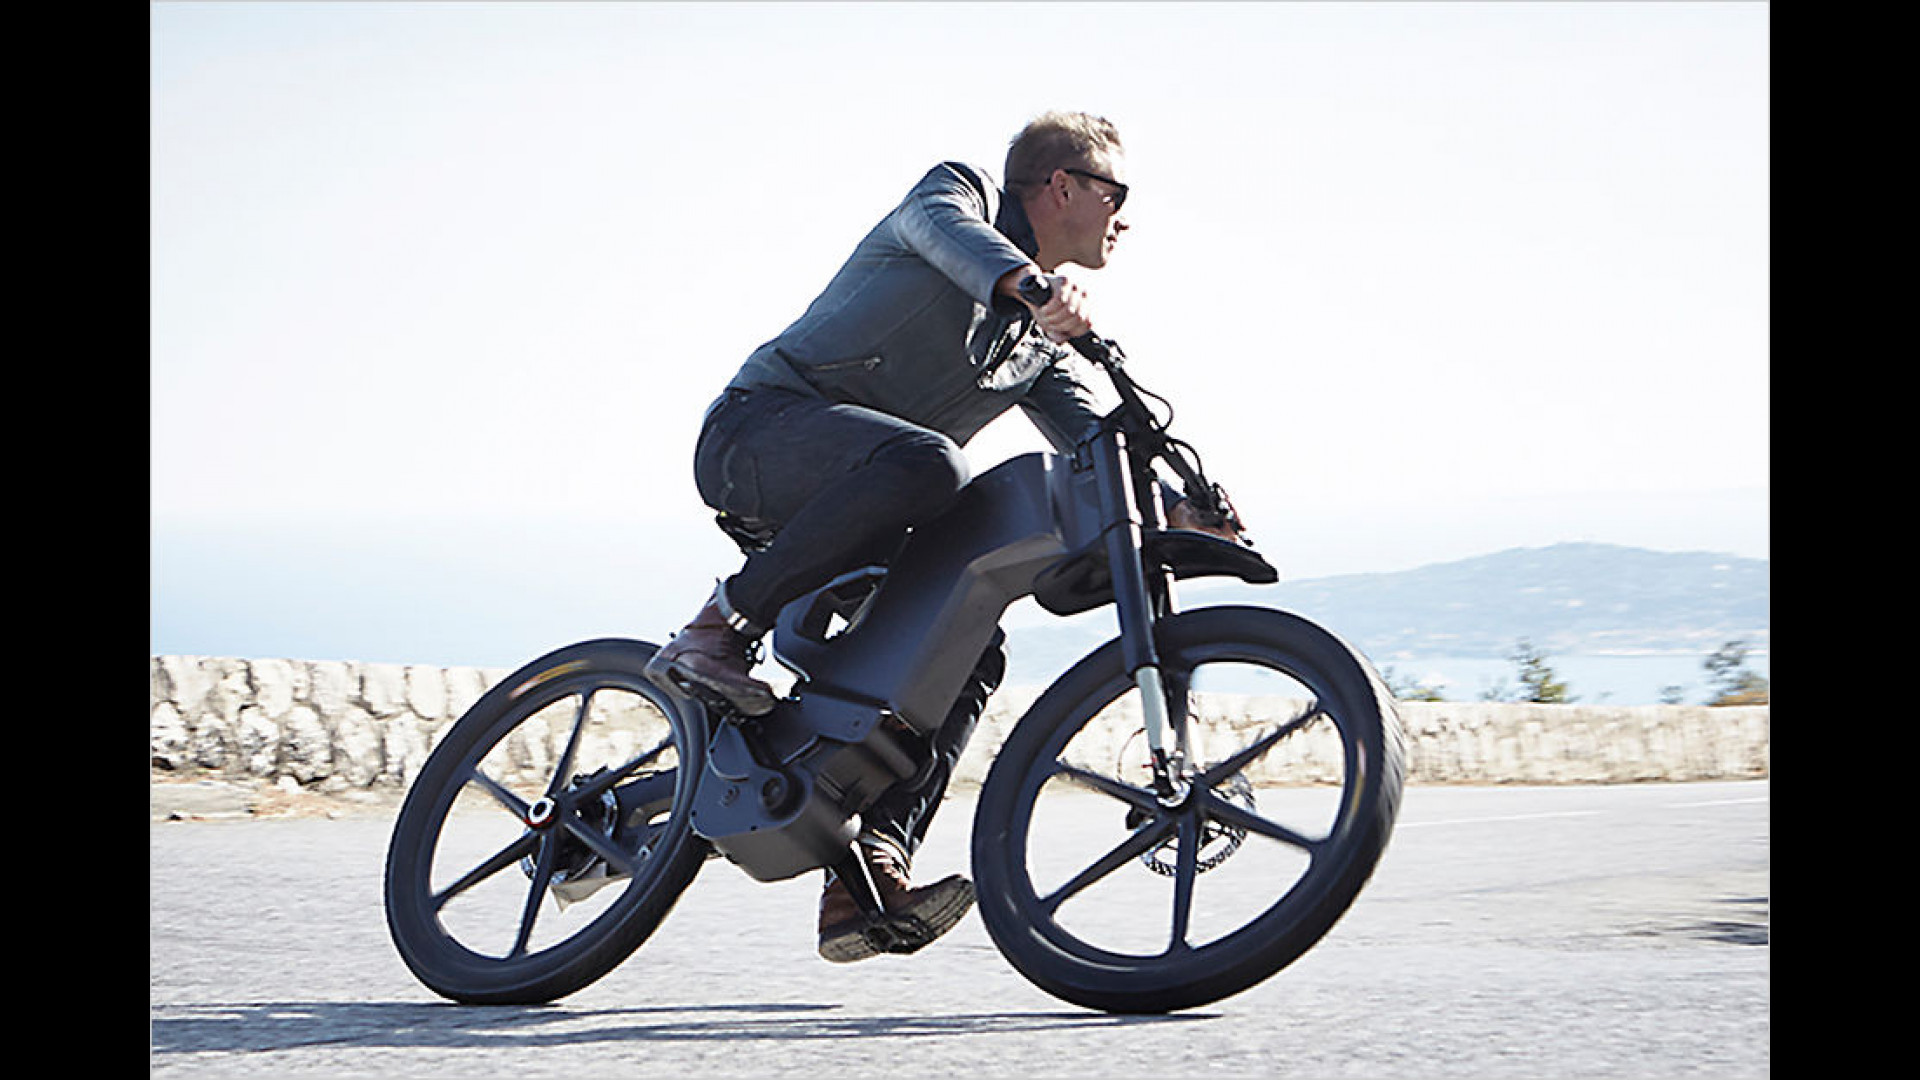 E Bike Von Trefecta 30 000 Euro Teures Elektro Fahrrad